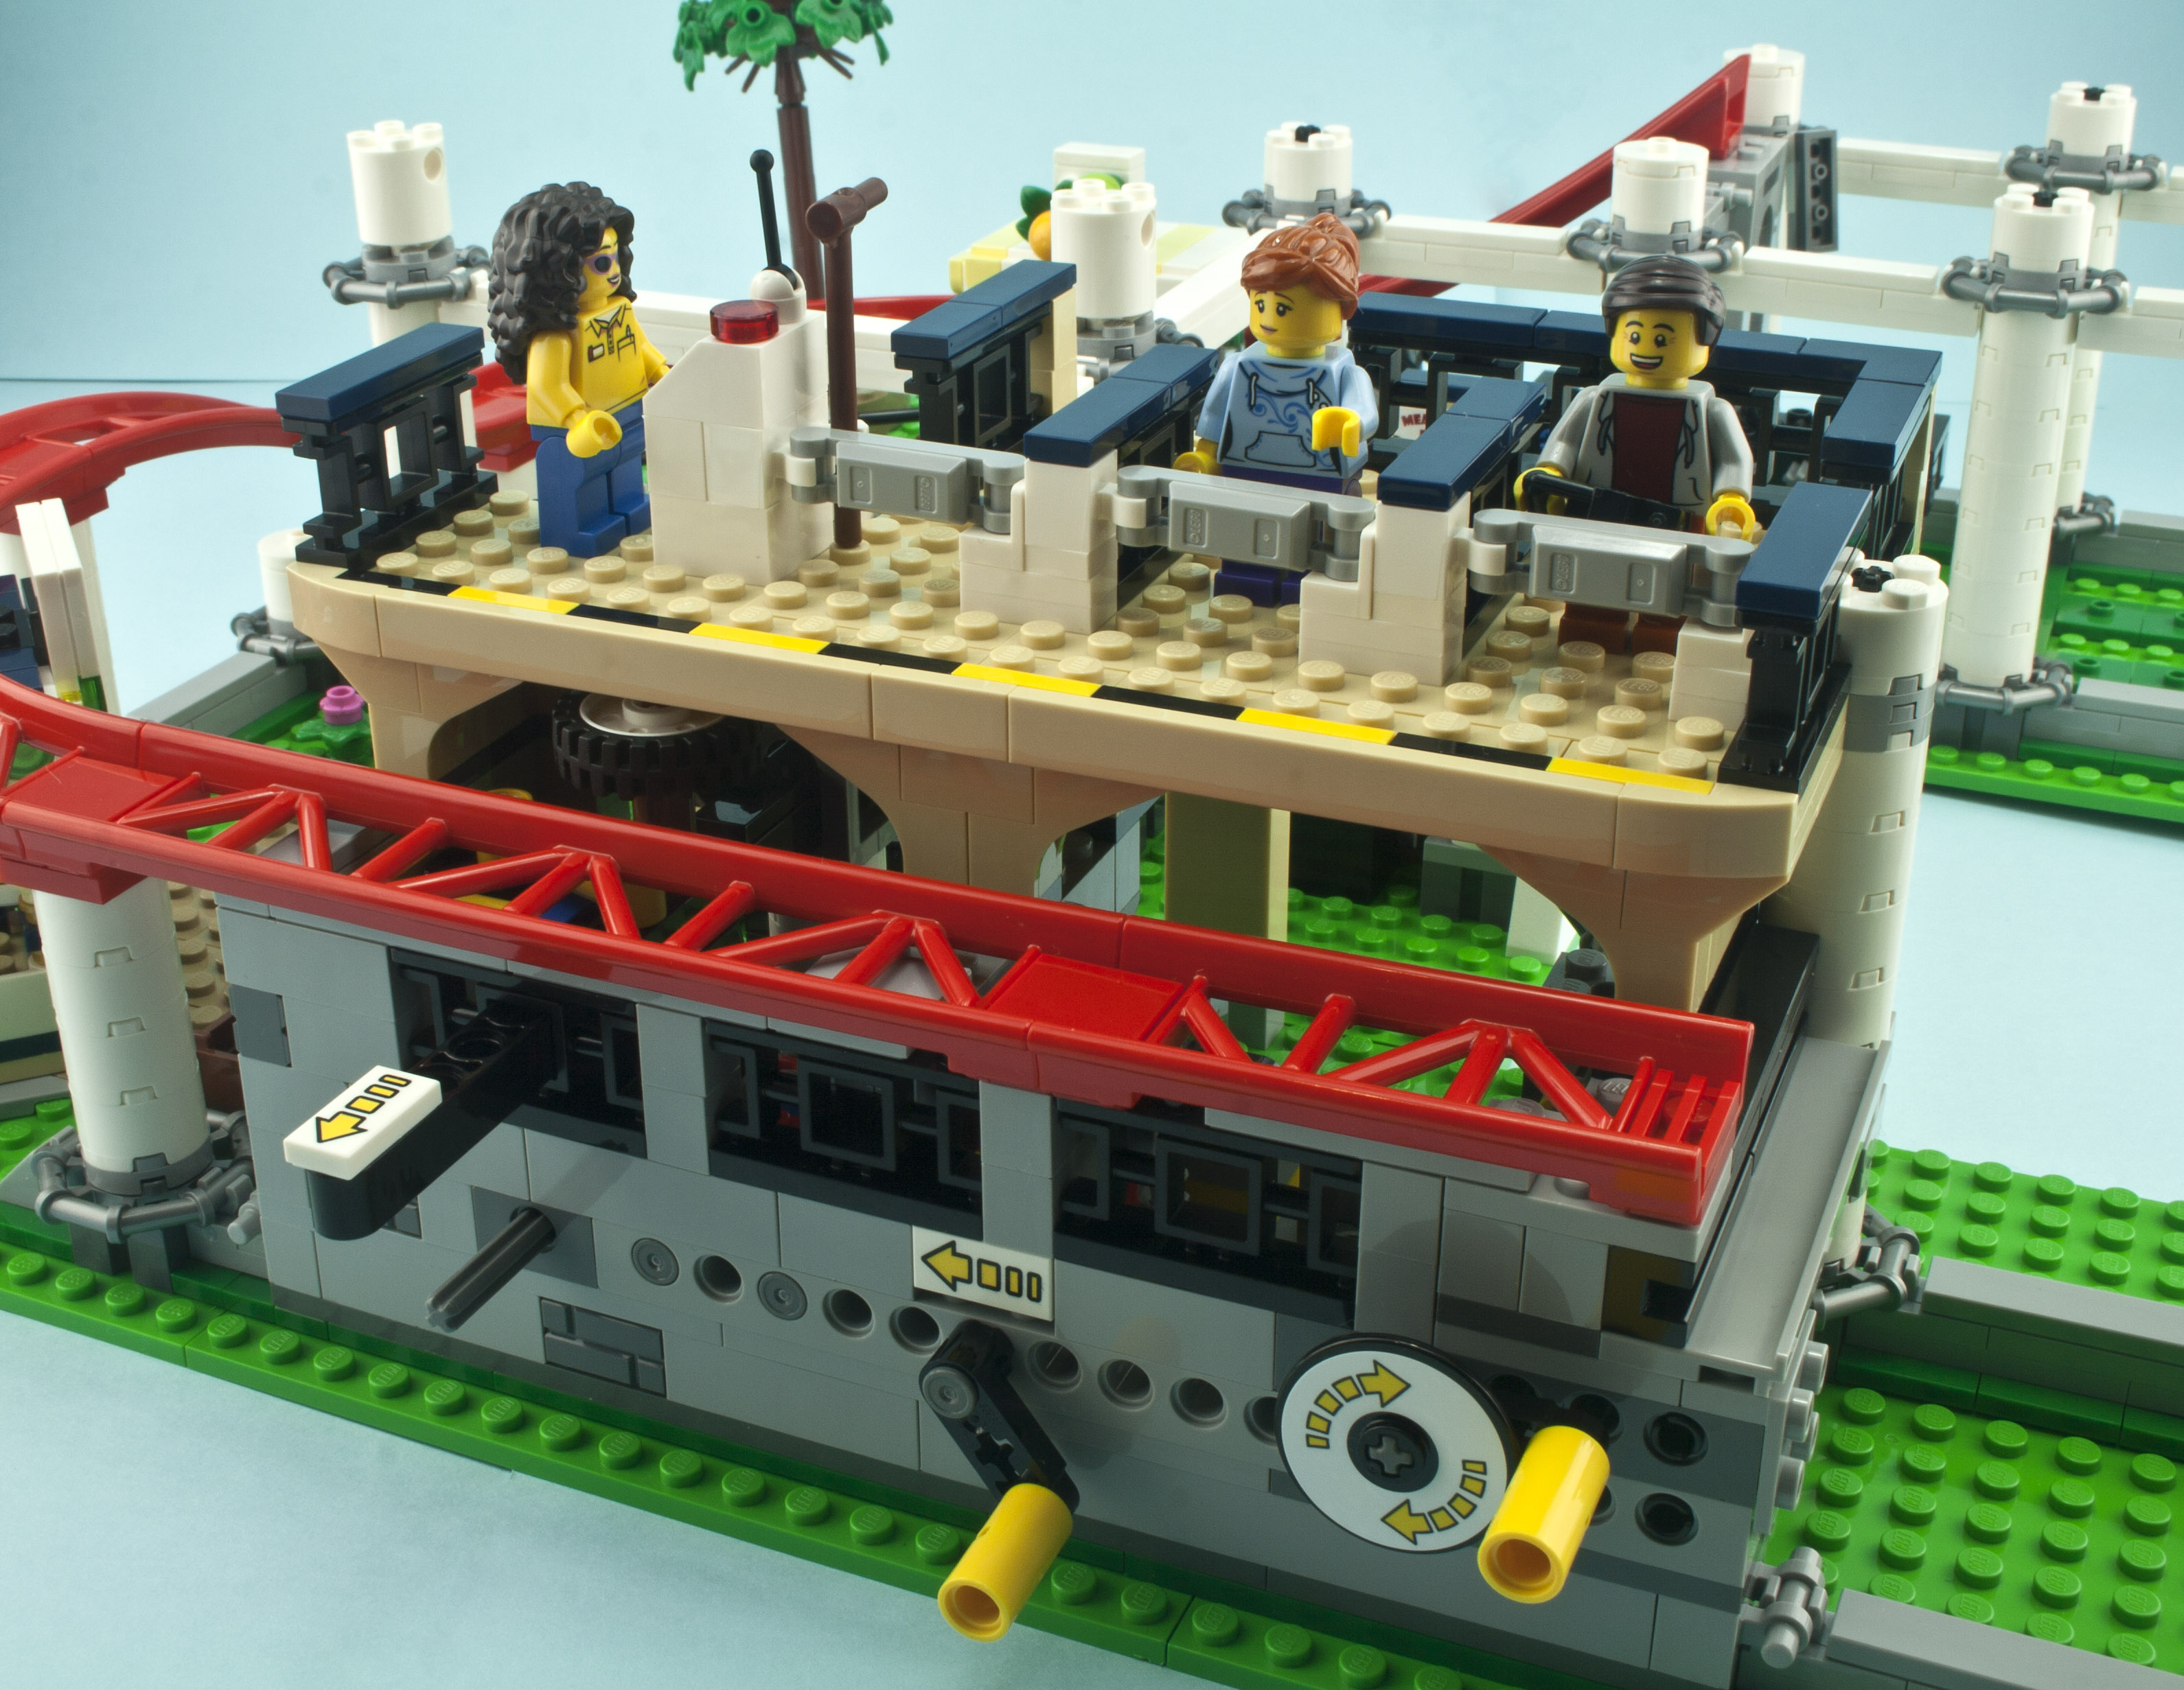 Review - LEGO 10261 Roller Coaster | Rebrickable - Build ...